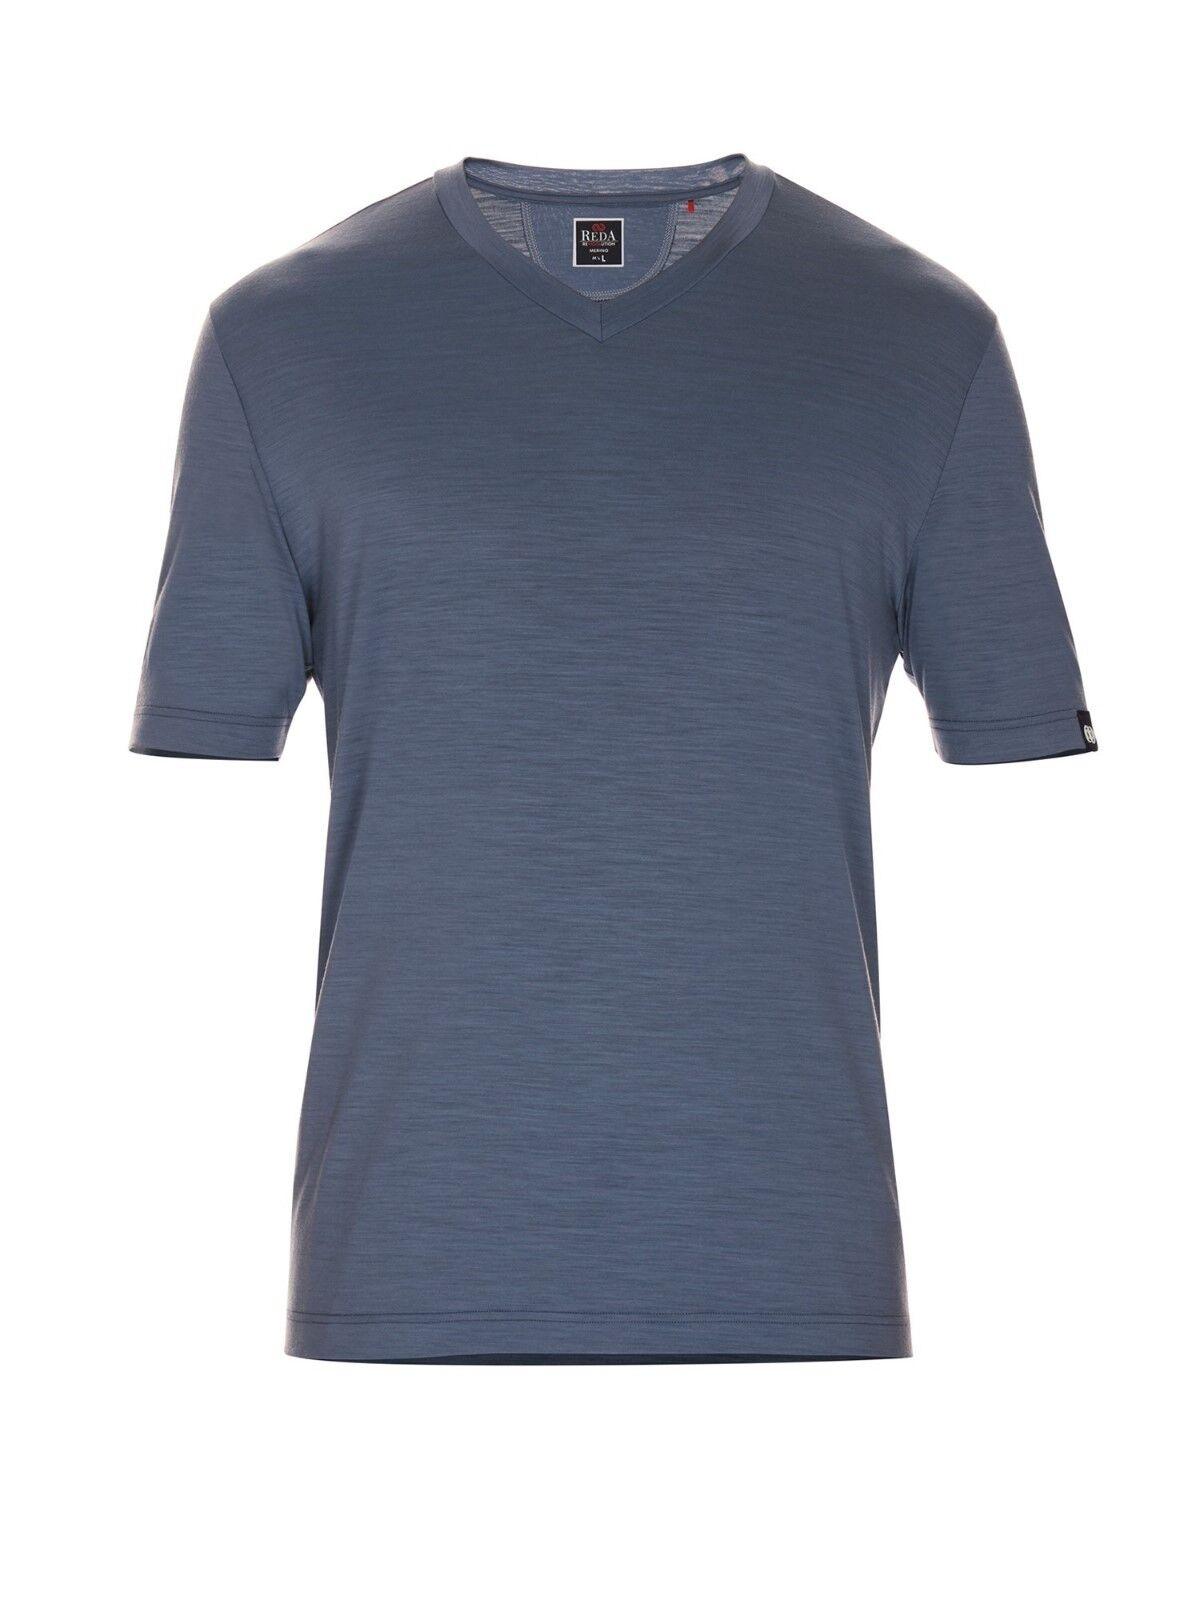 rotA Rewoolution Manni, Mens T-Shirt Short Sleeve 140, V-Ausschnitt, Merinowolle  | Produktqualität